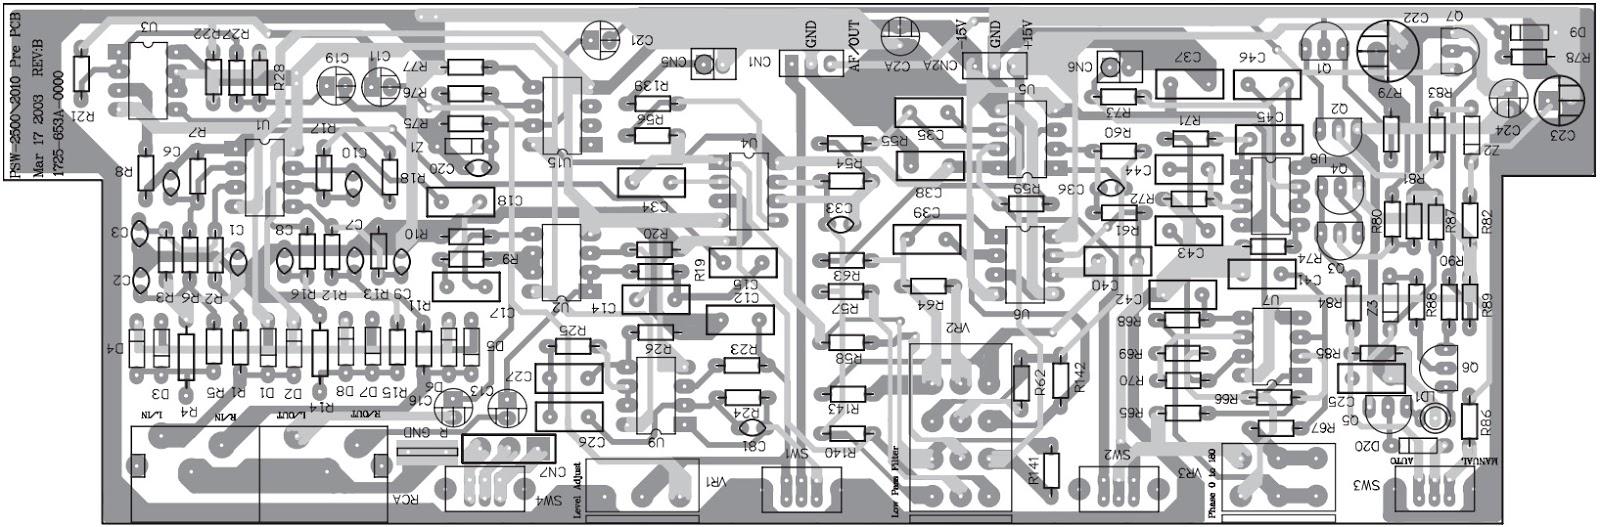 KEF PSW 2500 Powered Subwoofer – Schematic Diagram